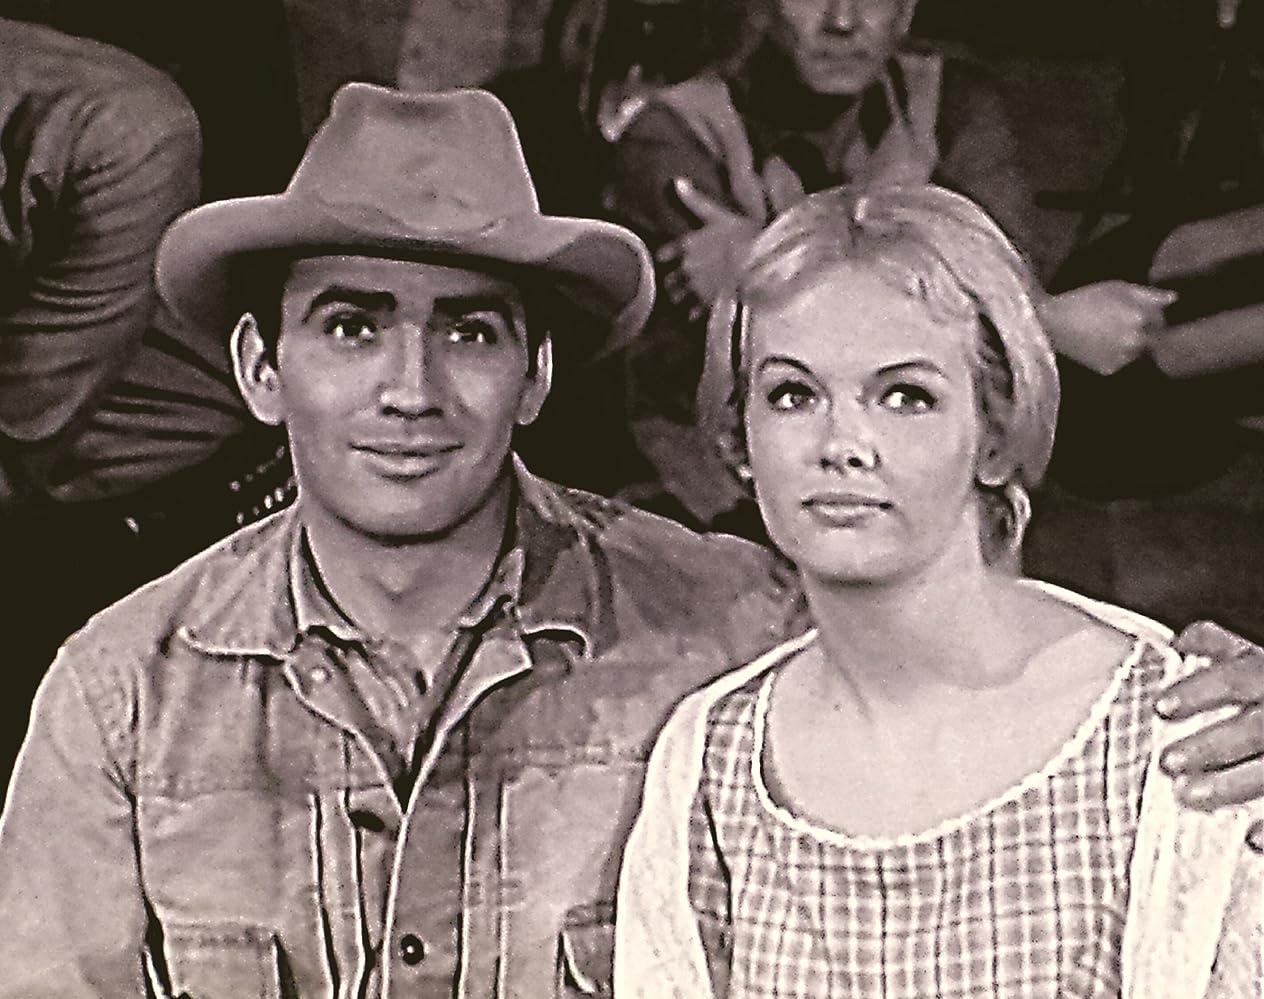 Will Hay (1888?949),Monica Scattini XXX pics & movies Kelly Sullivan (actress),Dorothy Paul (born 1937)